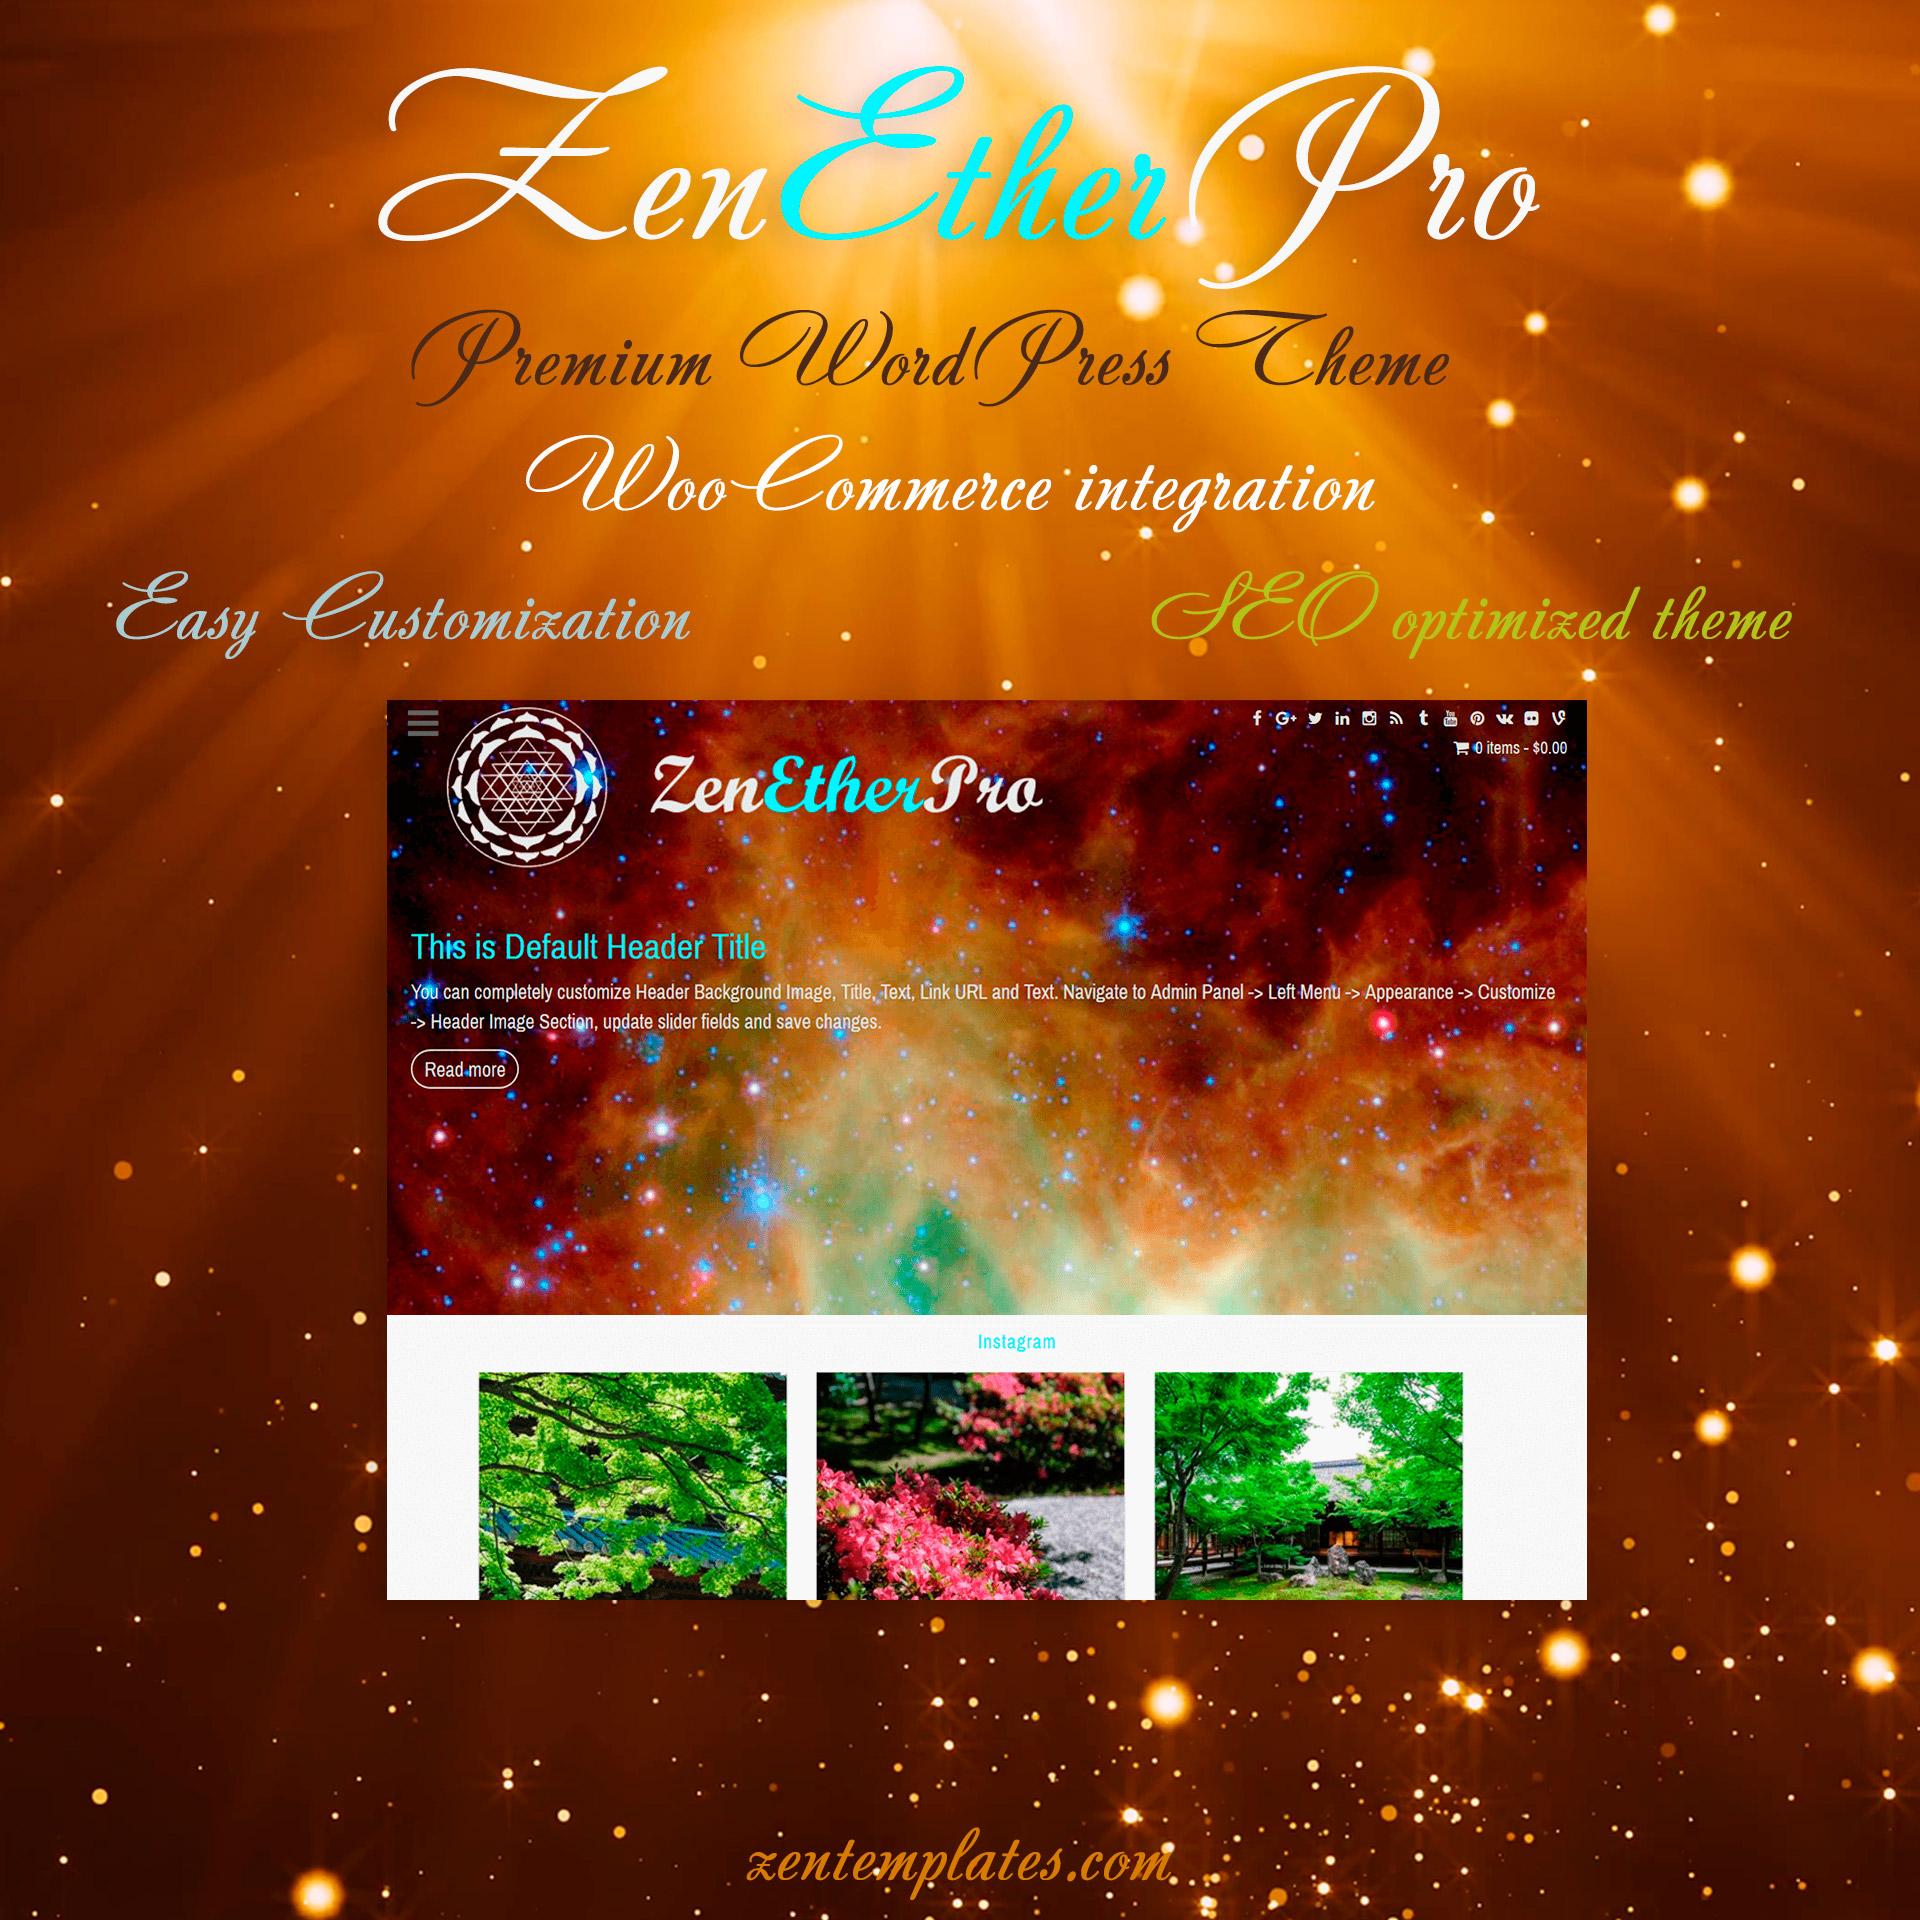 zenetherpro-premium-wordpress-theme-mockup-zentemplates-com